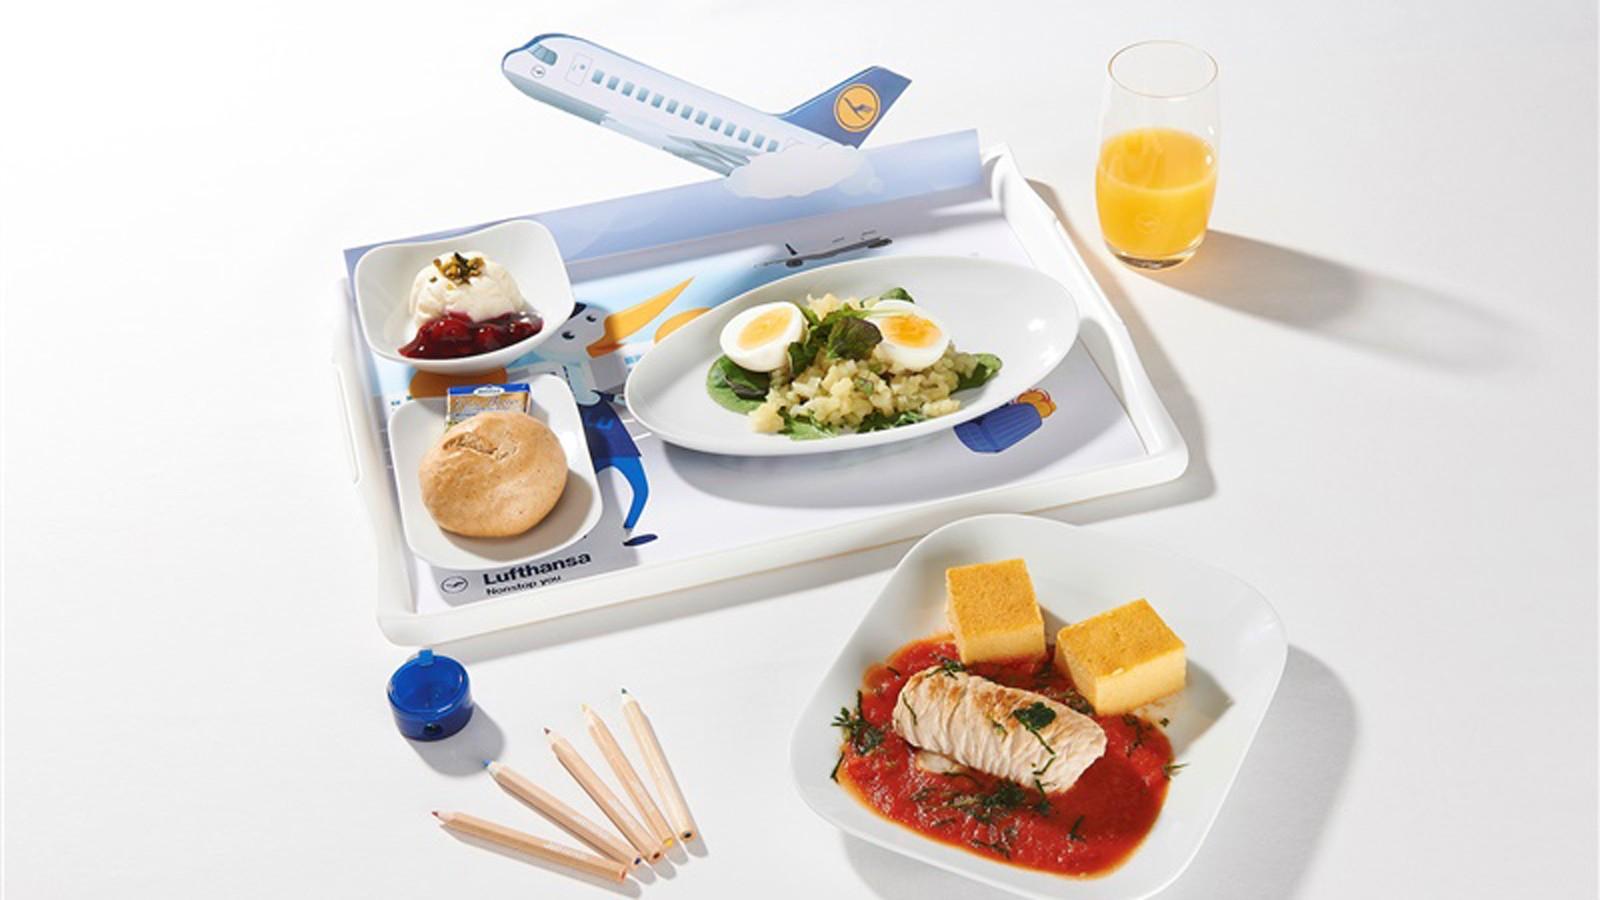 Emirates Economy Food And Drink